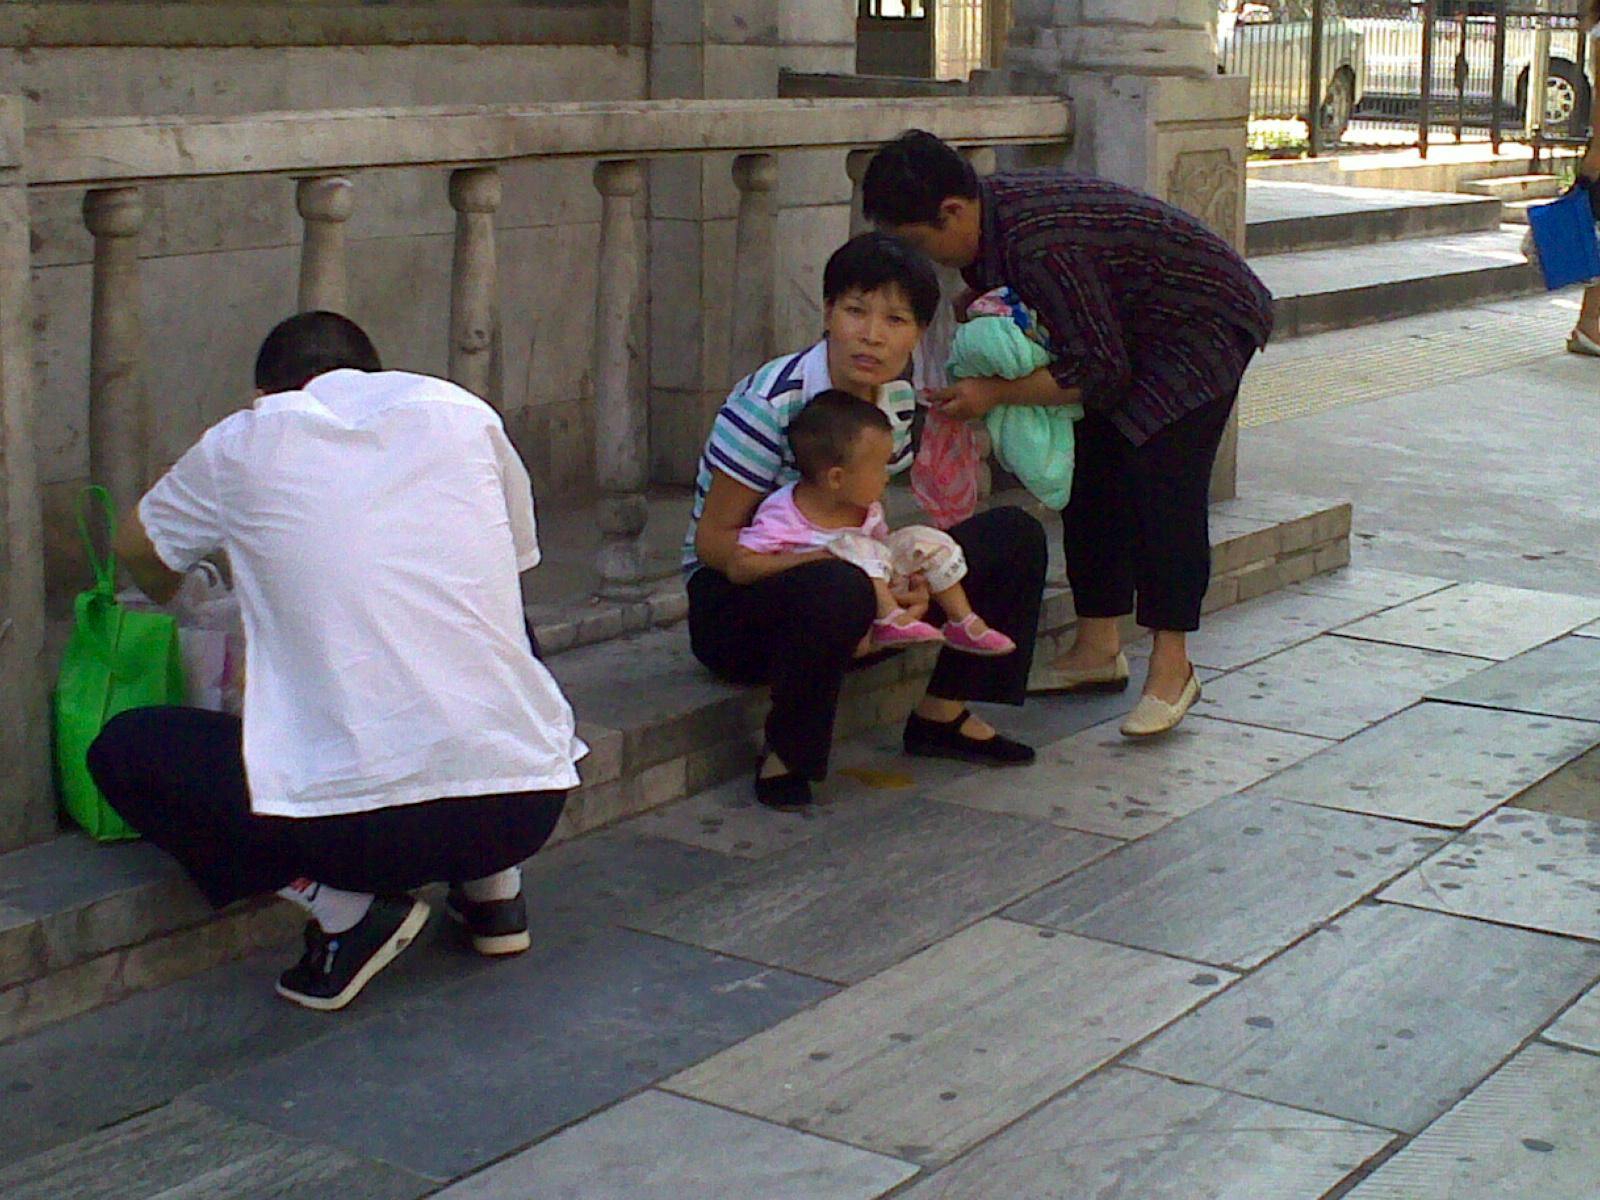 Freddie roach says chinas zou shiming must dump amateur ideas